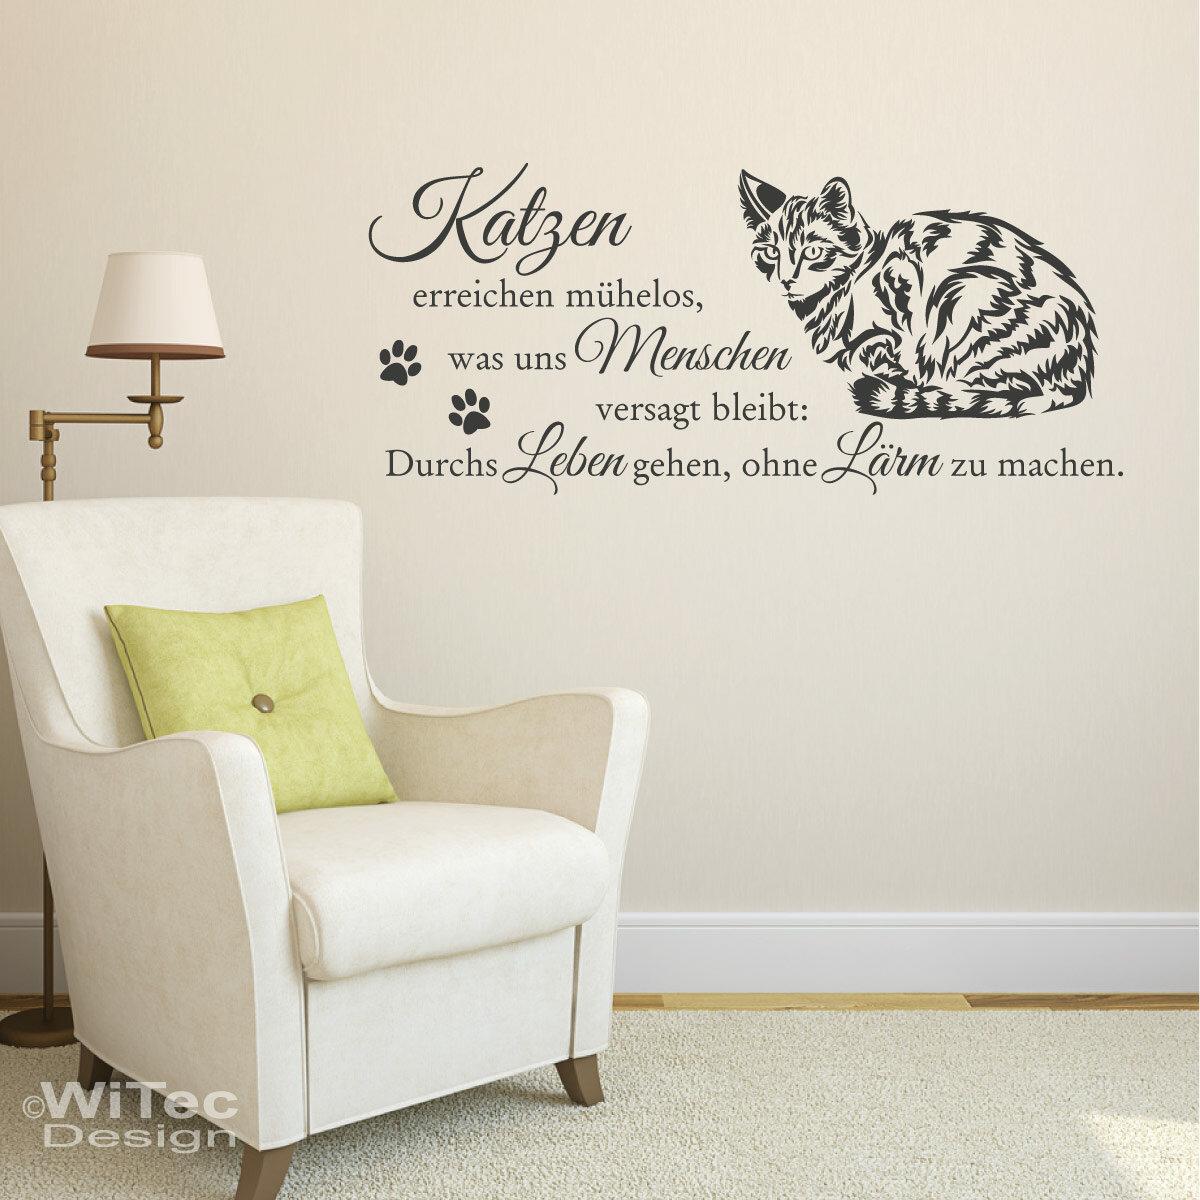 Wandtattoo Katzenpfoten : Wandtattoo katzenpfoten tattoos